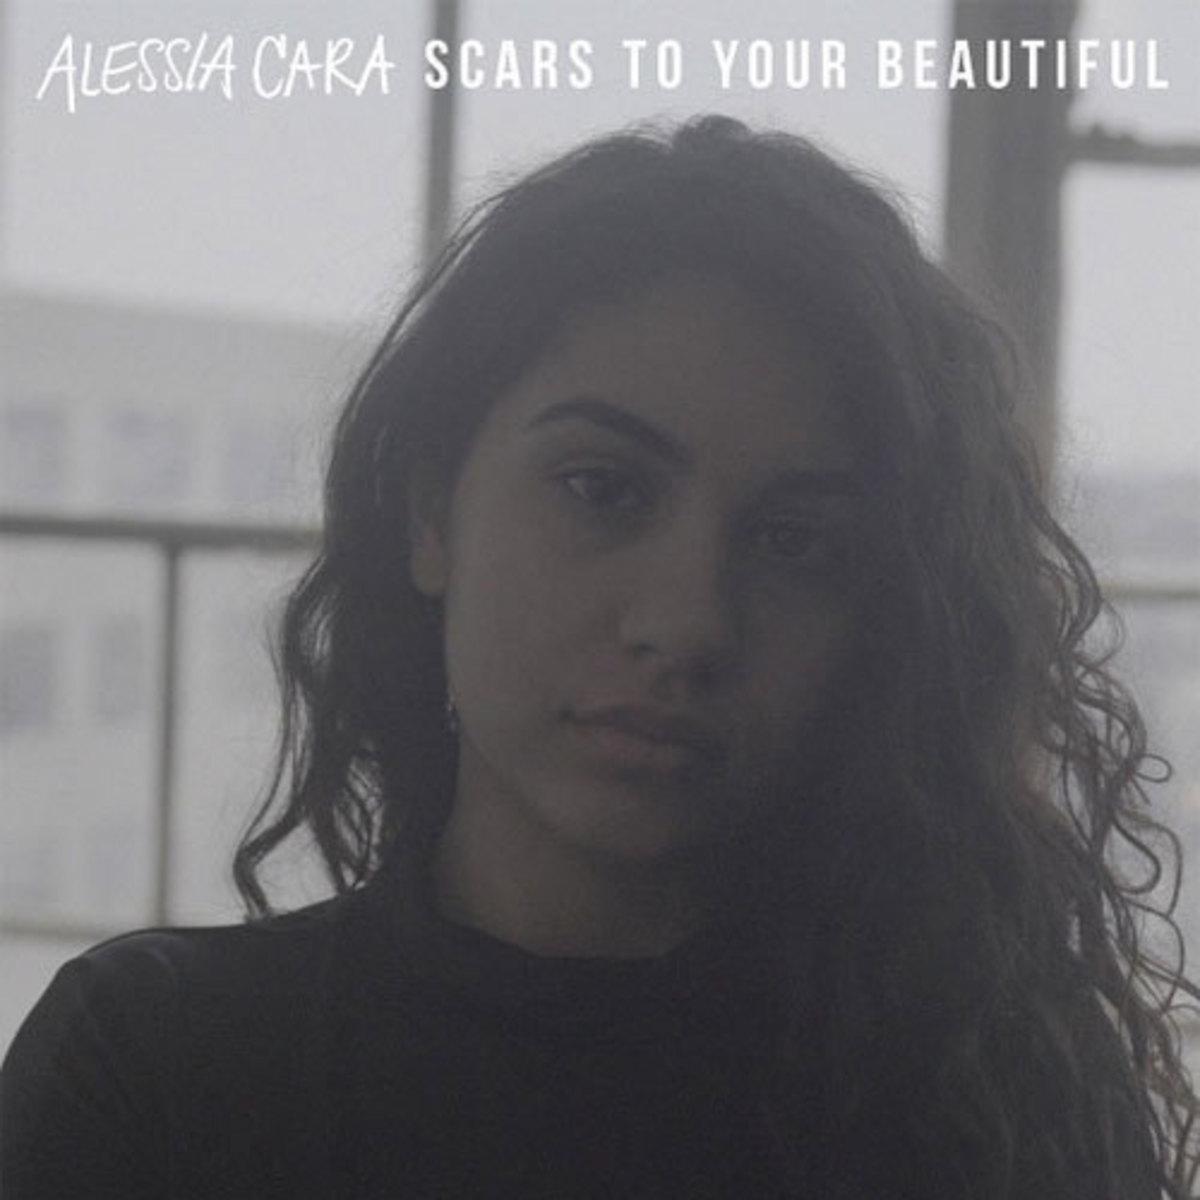 alessia-cara-scars-to-your-beautiful.jpg